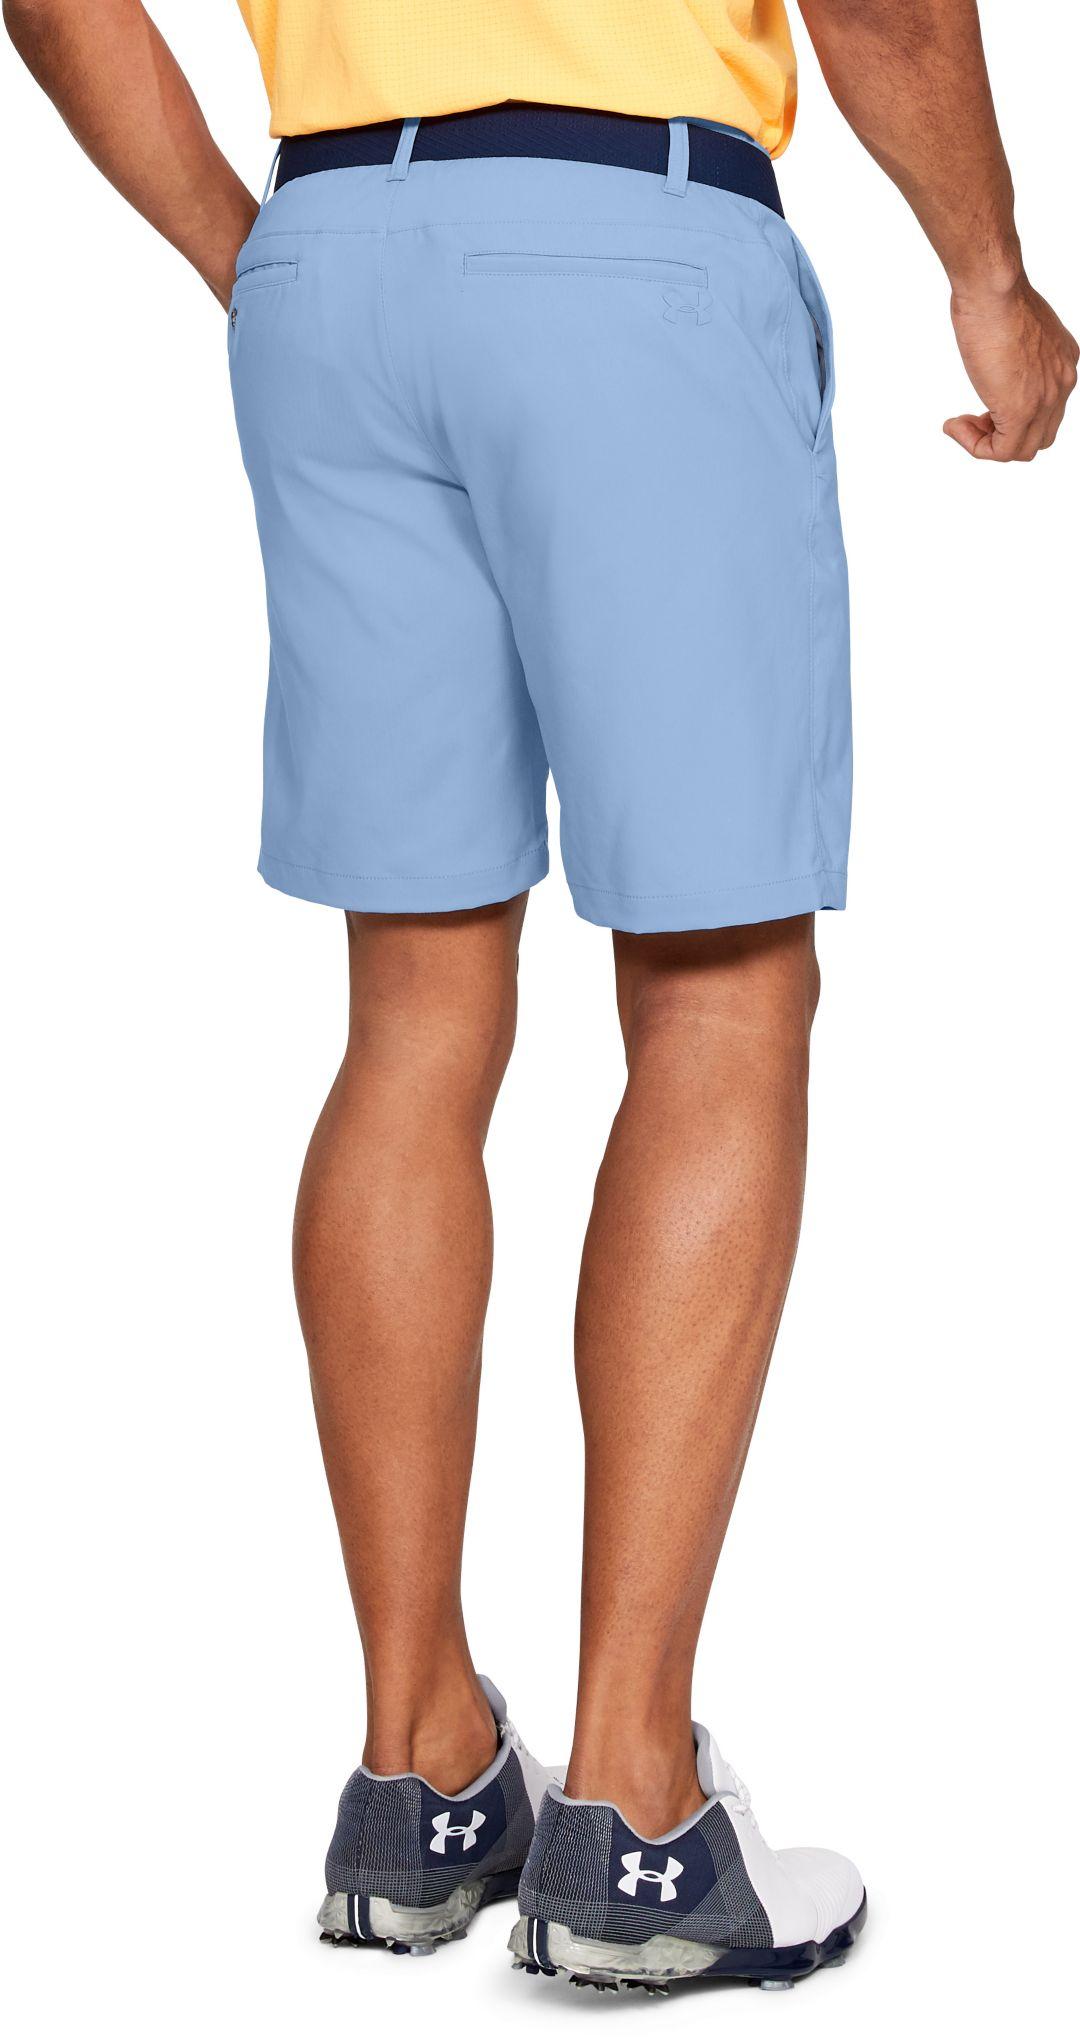 cd9b389897 Under Armour Men's Showdown Golf Shorts